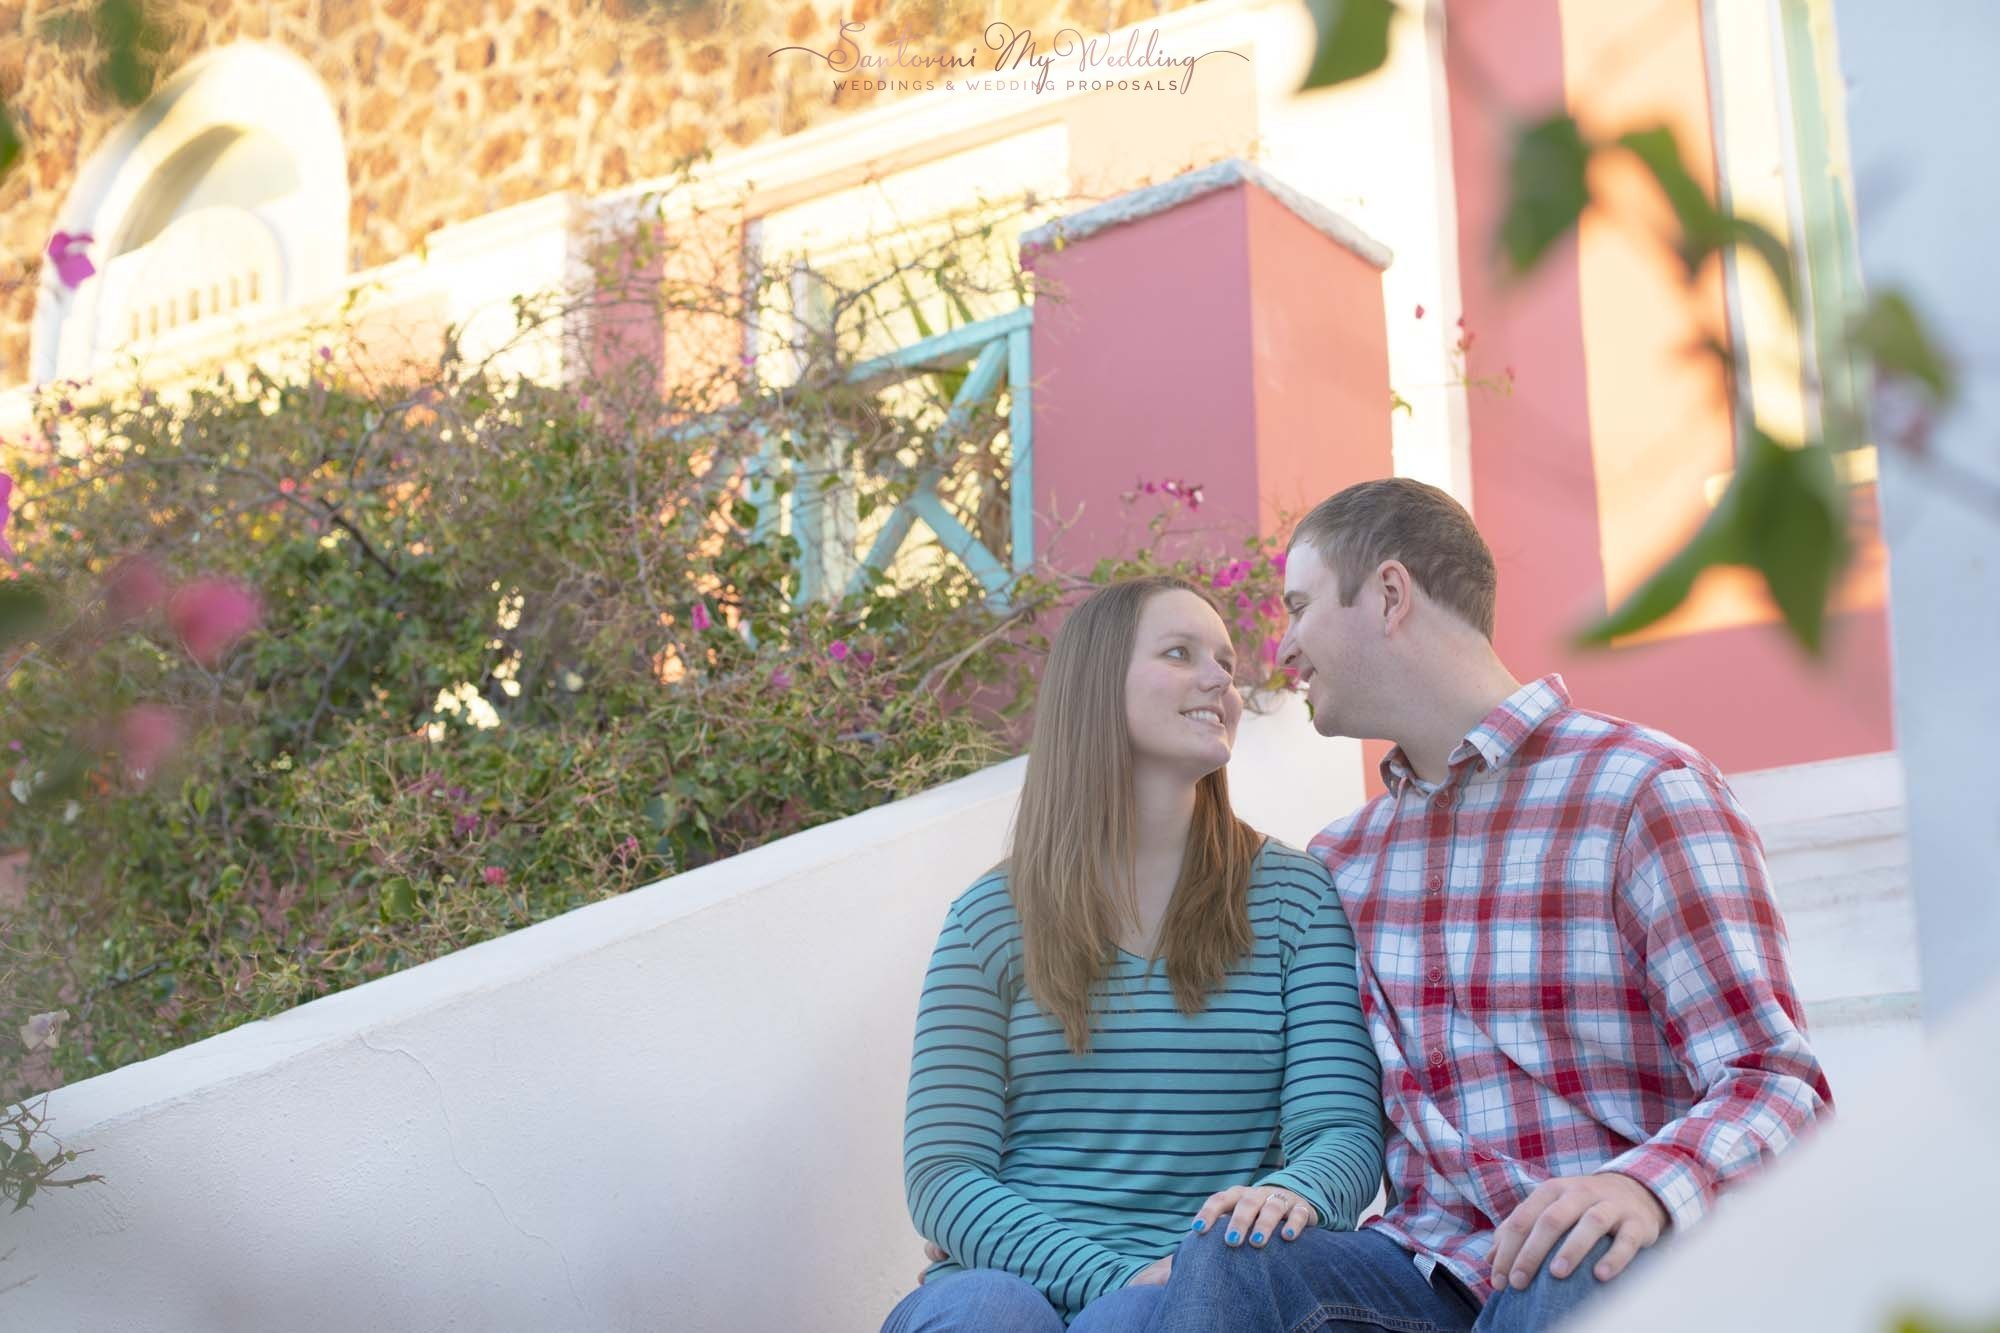 Sweet Proposal 1